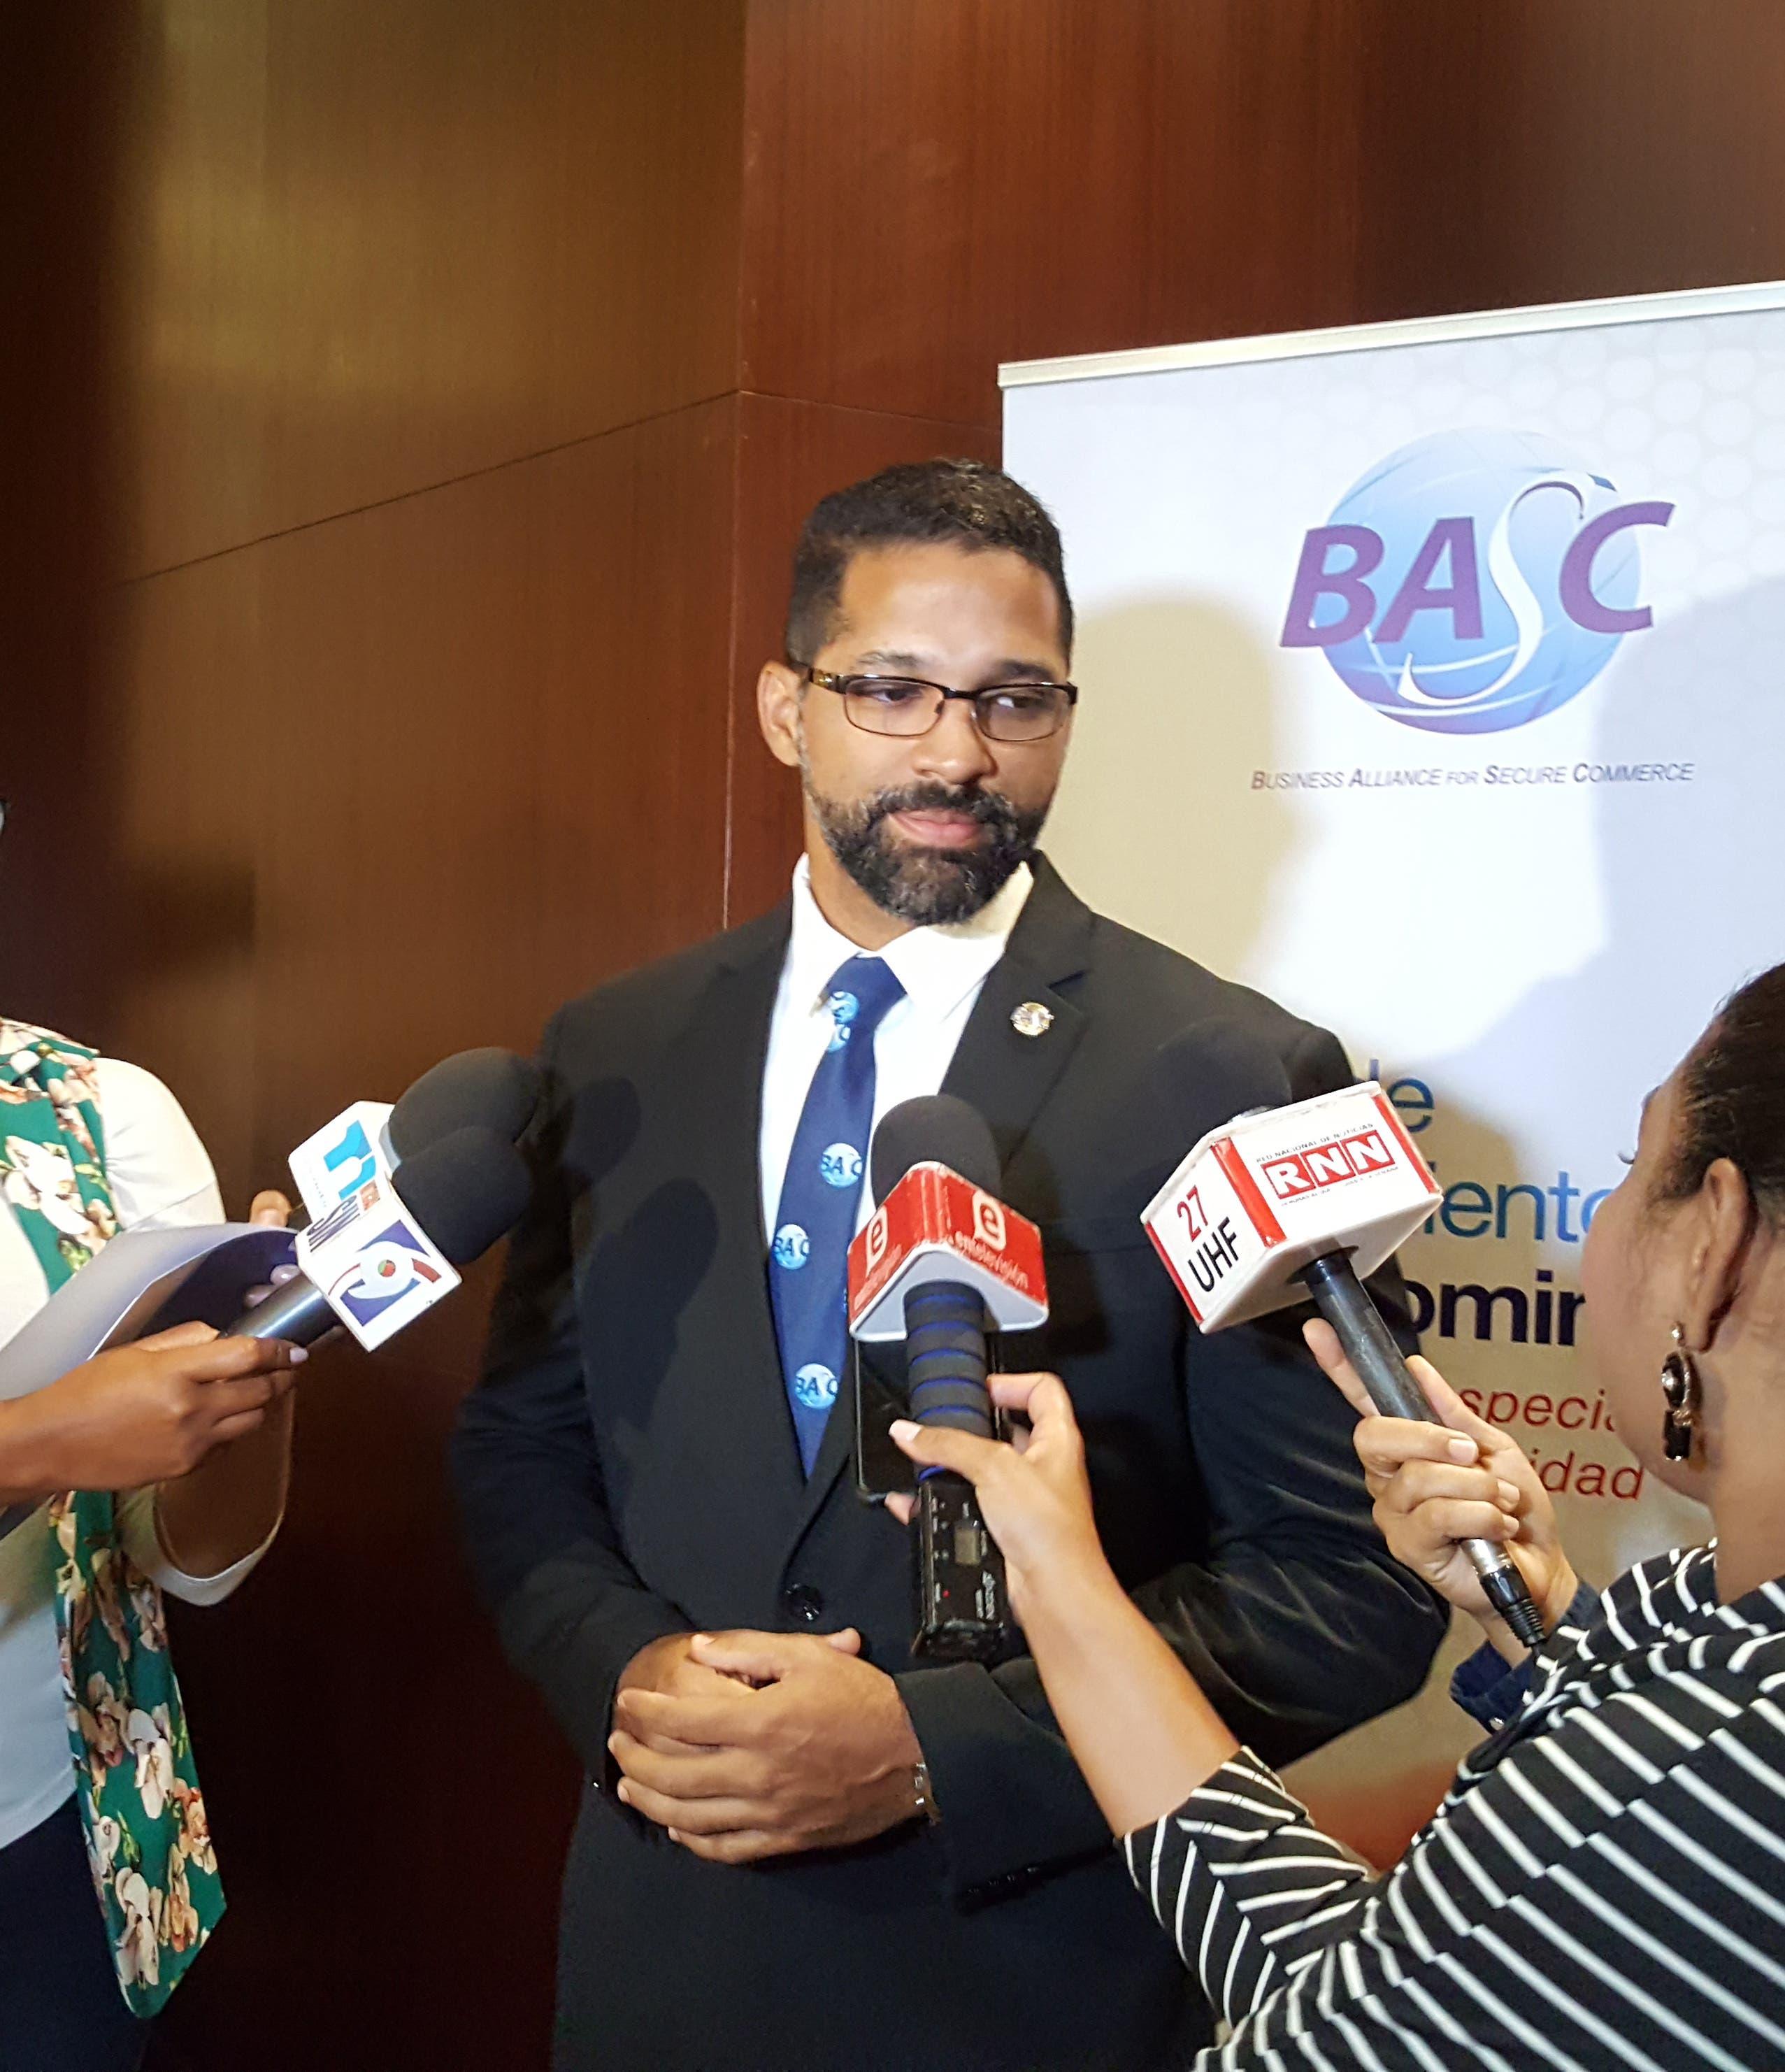 BASC-RD instan a mantener sistemas de seguridad durante crisis sanitaria